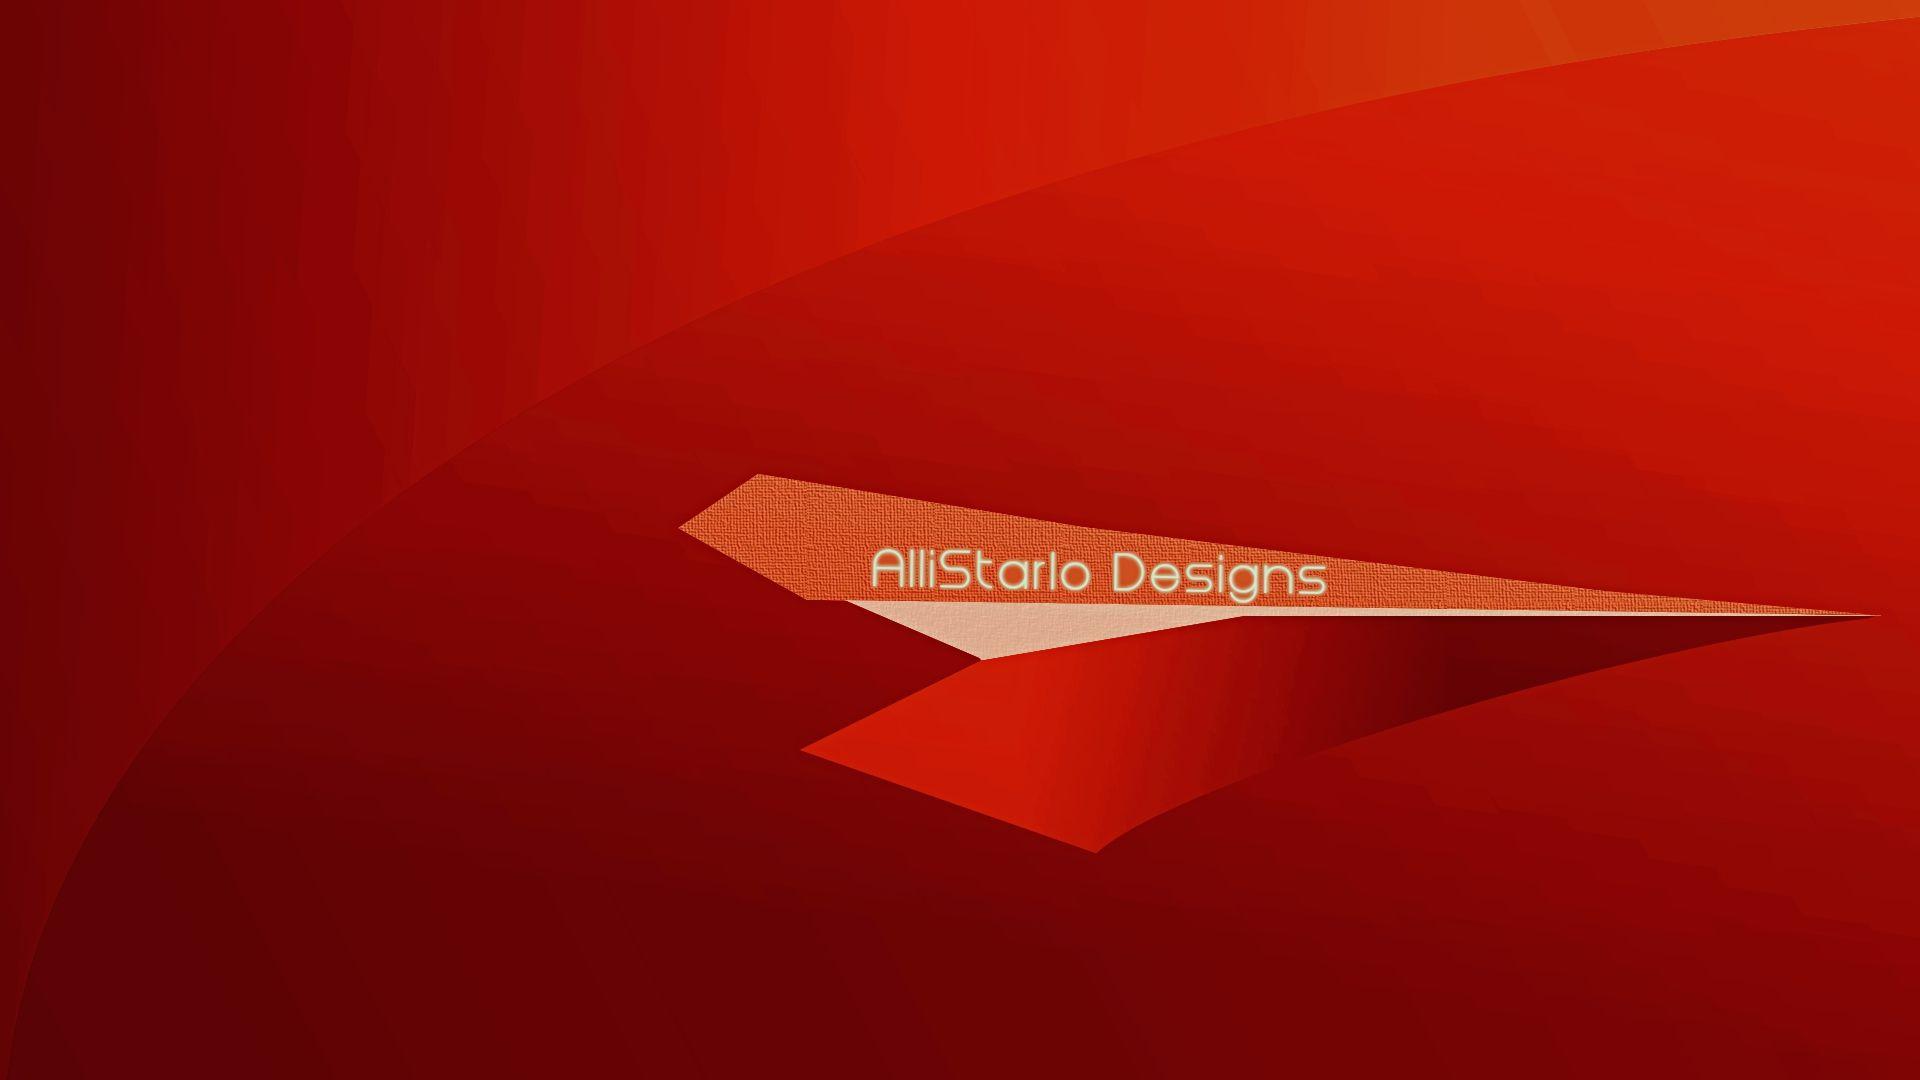 Abstract AlliStarlo Wallpaper. Very Vivid Red!